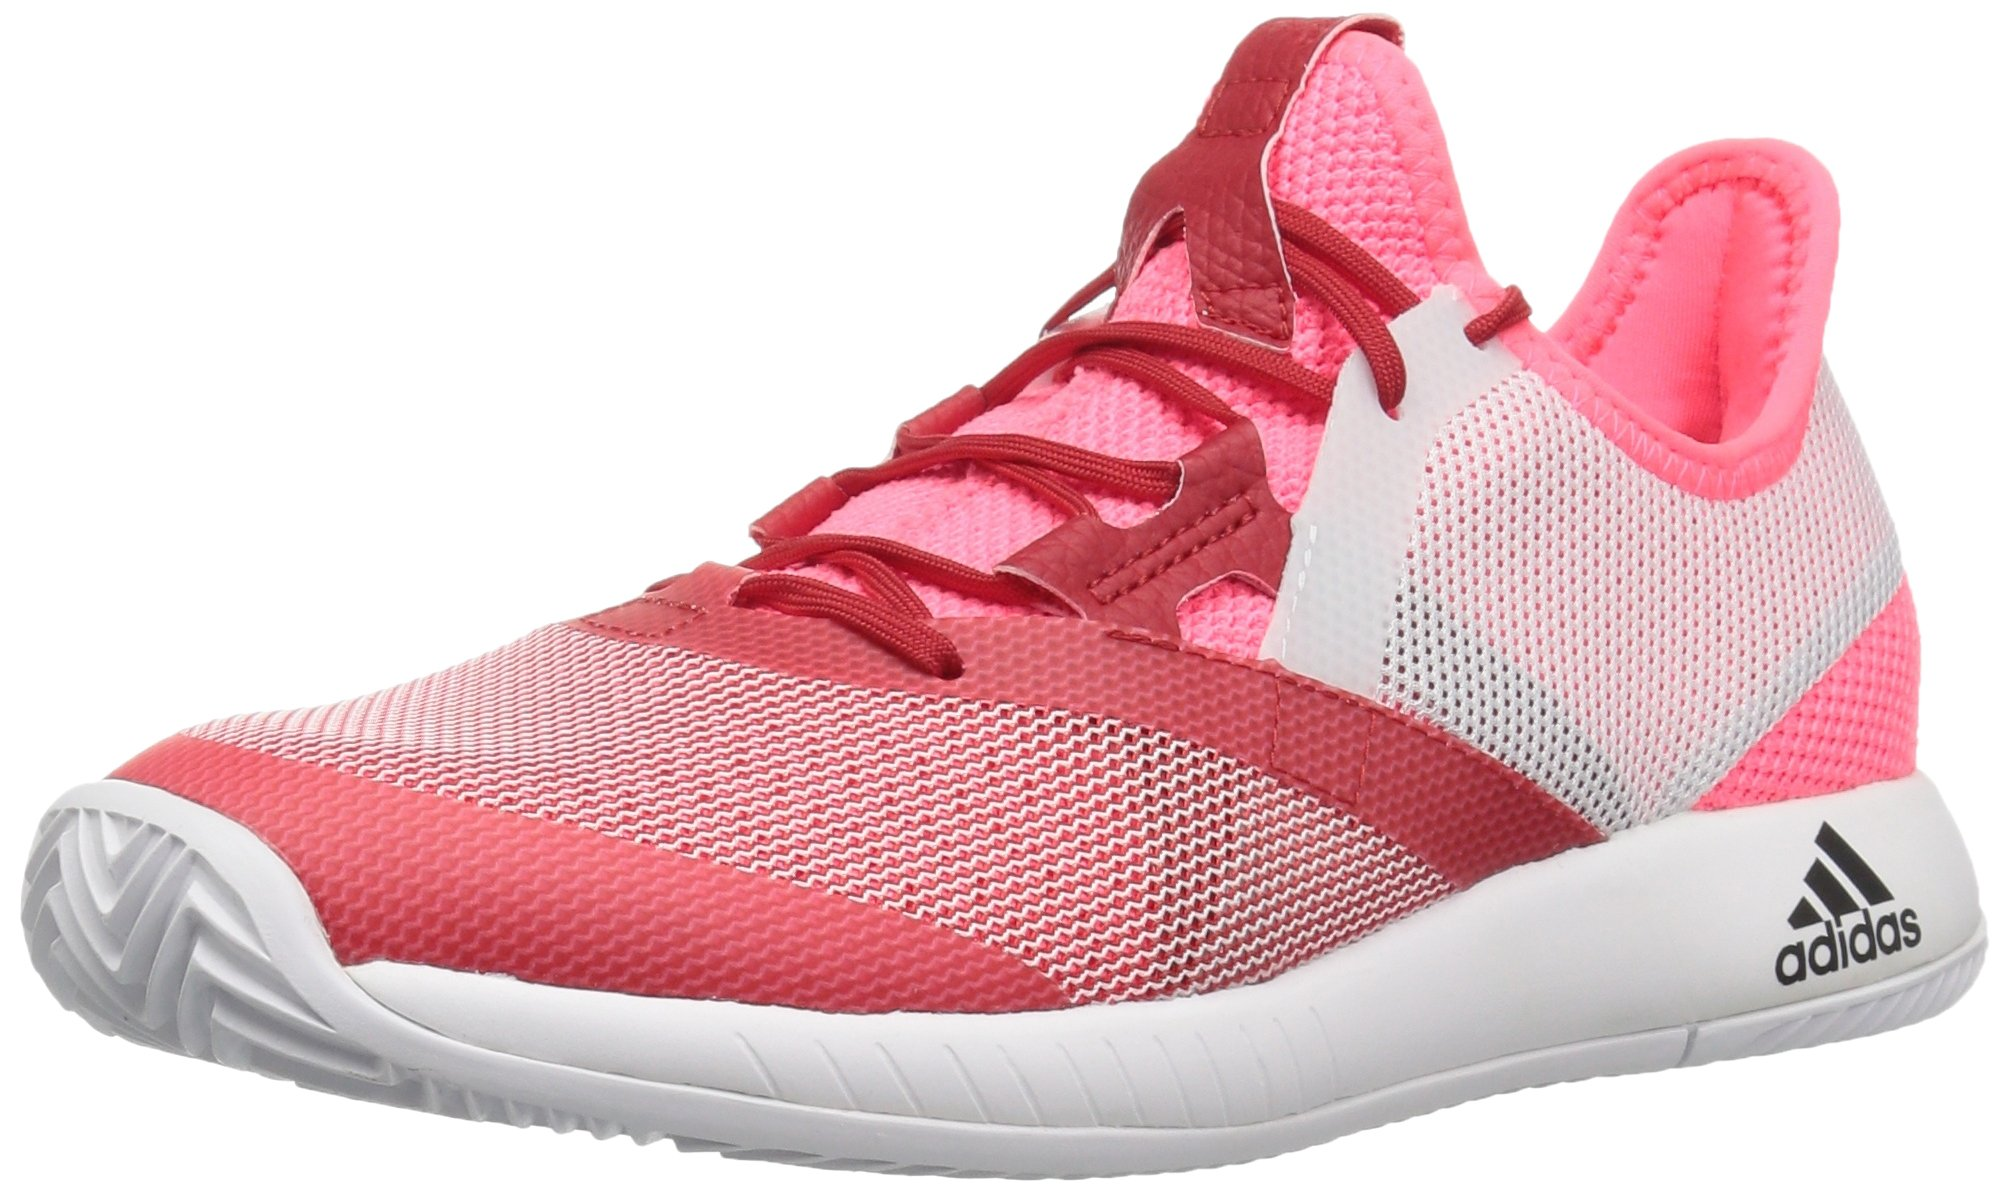 adidas Women's Adizero Defiant Bounce Tennis Shoe Flash red/White/Scarlet 6 M US by adidas (Image #1)